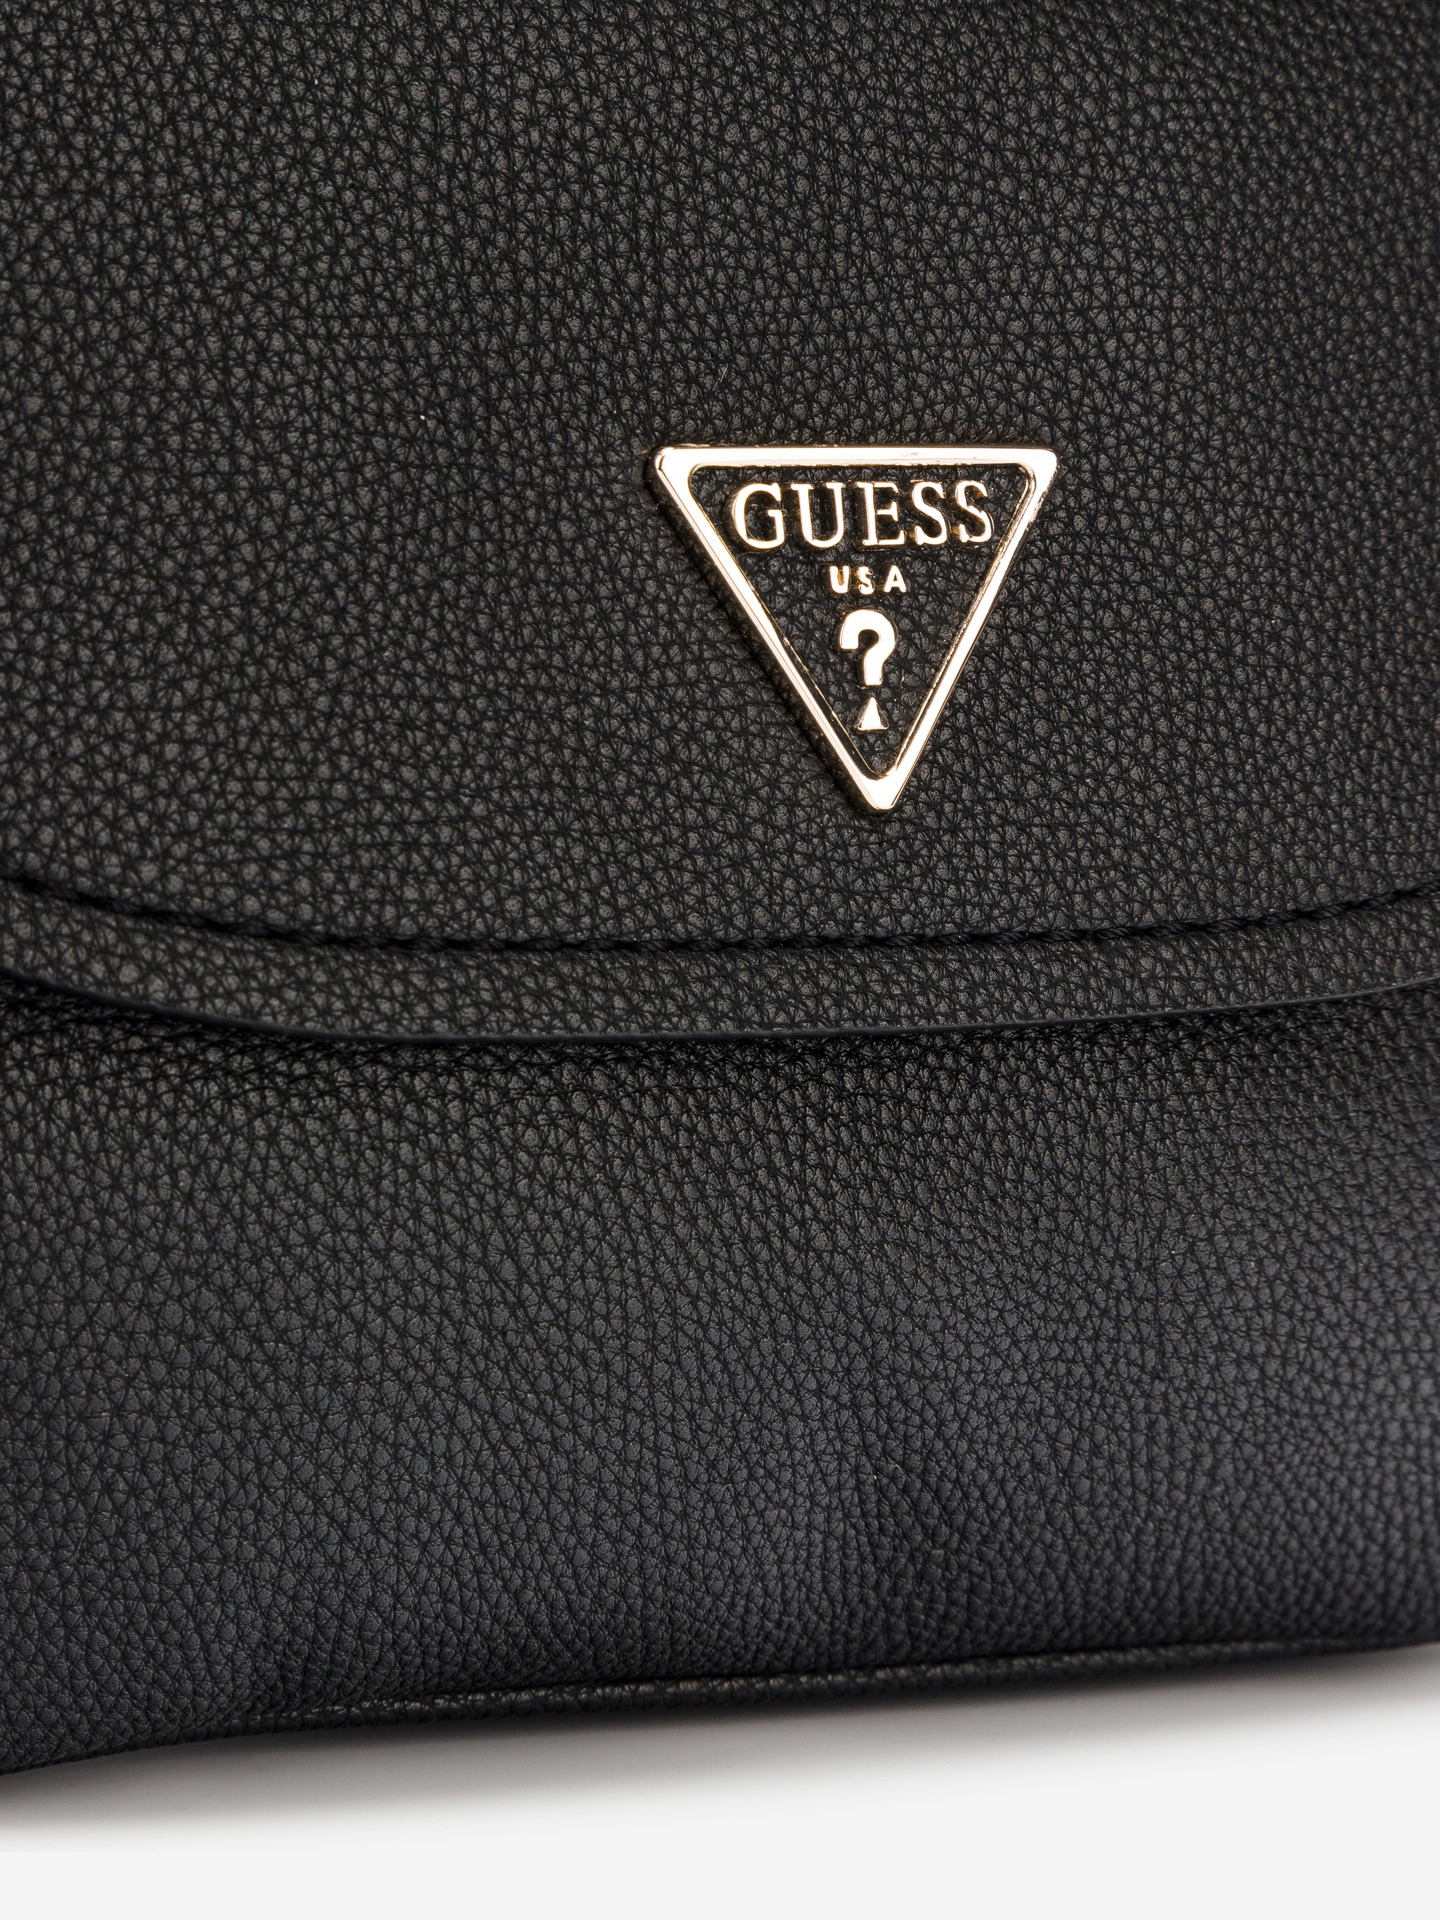 Guess black handbag Destiny